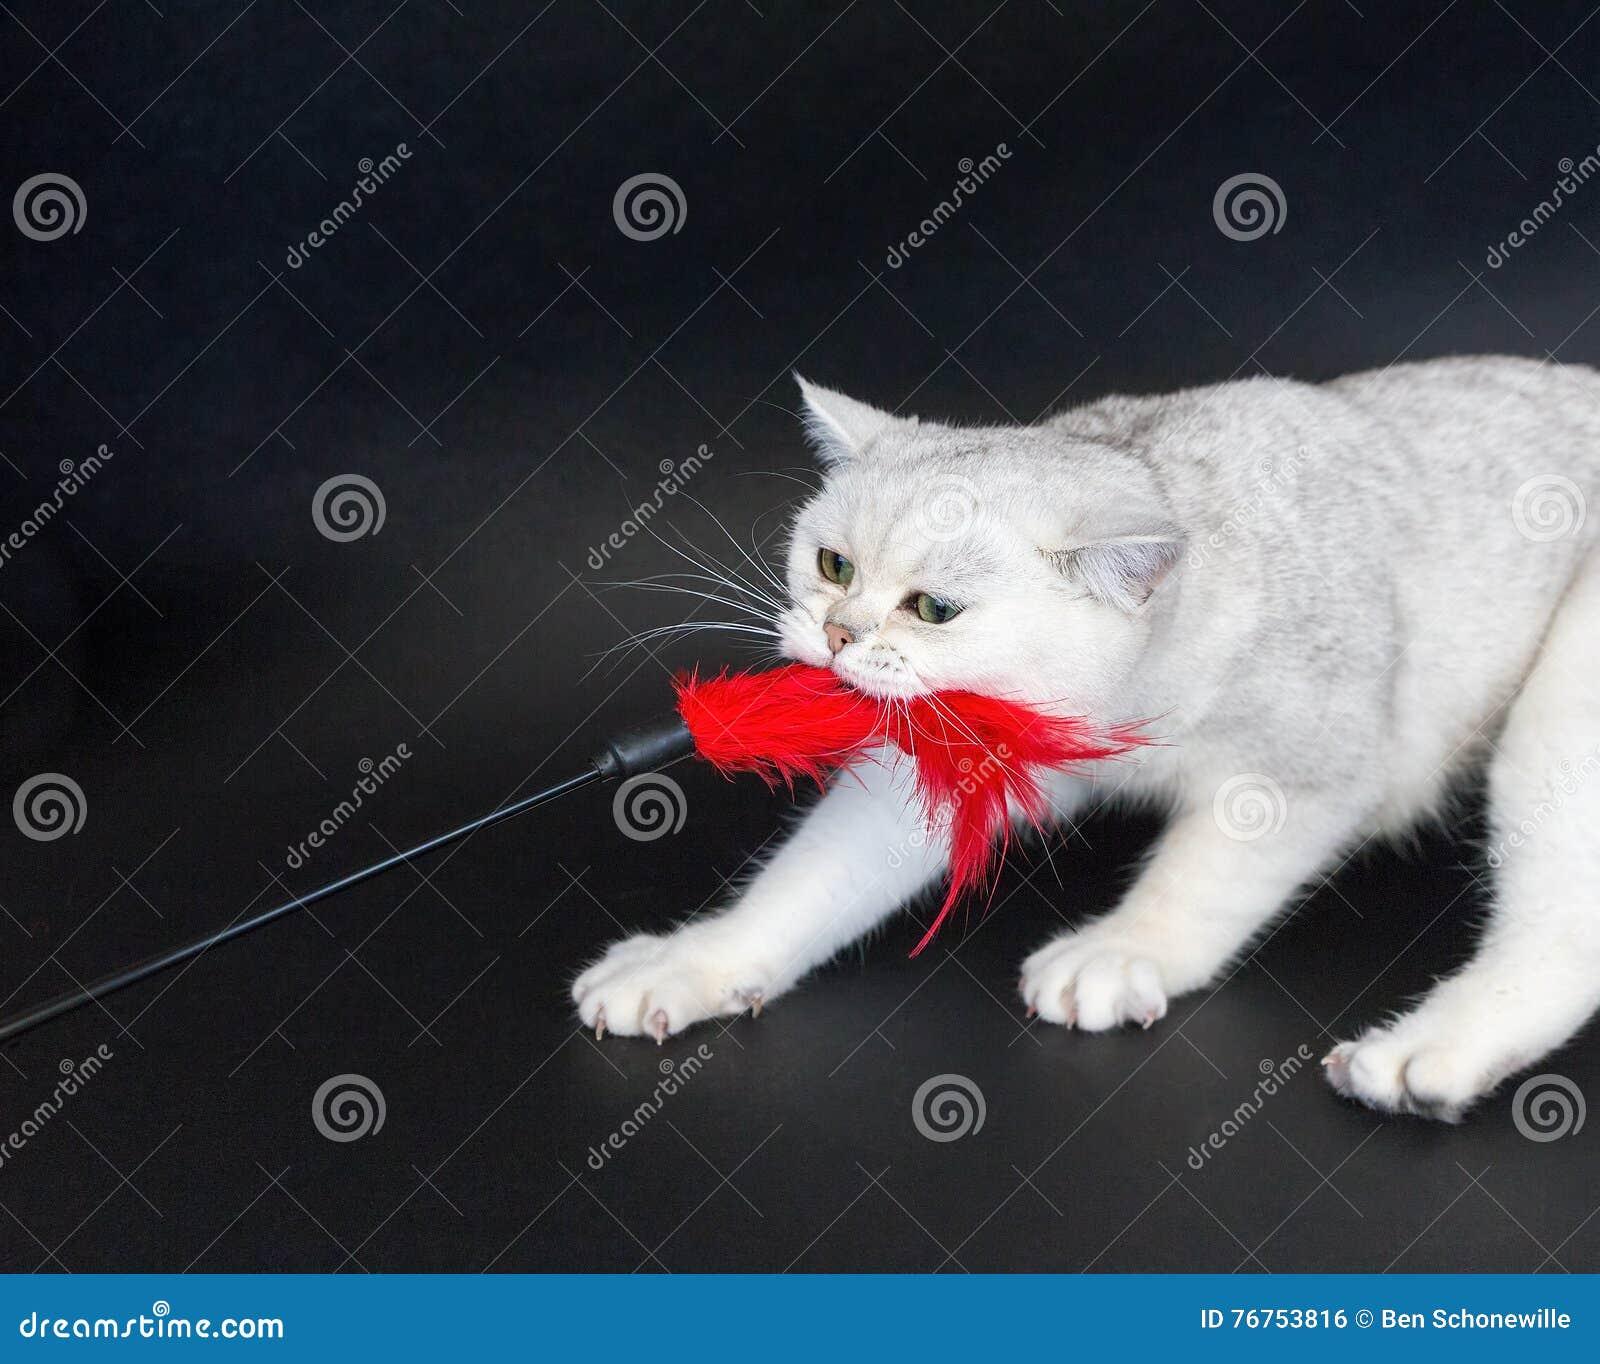 De Blanco Juguete Juega Archivo Foto Rojo Del Tirando Que Gato Xsrdtchq bIvygYmf76